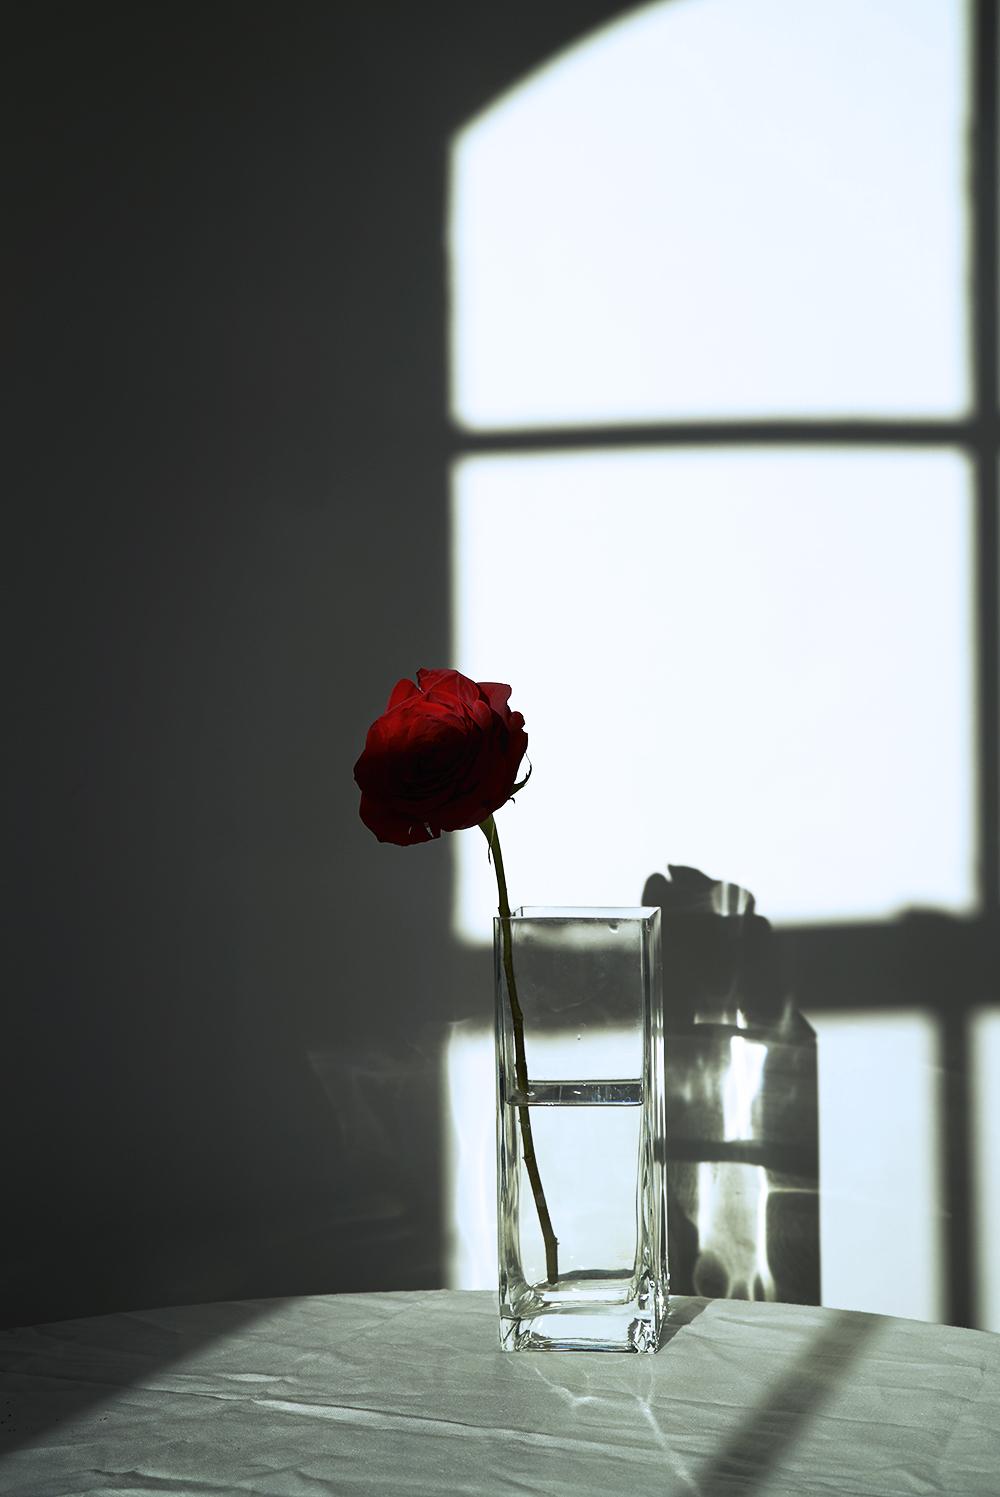 rose1_sm.jpg